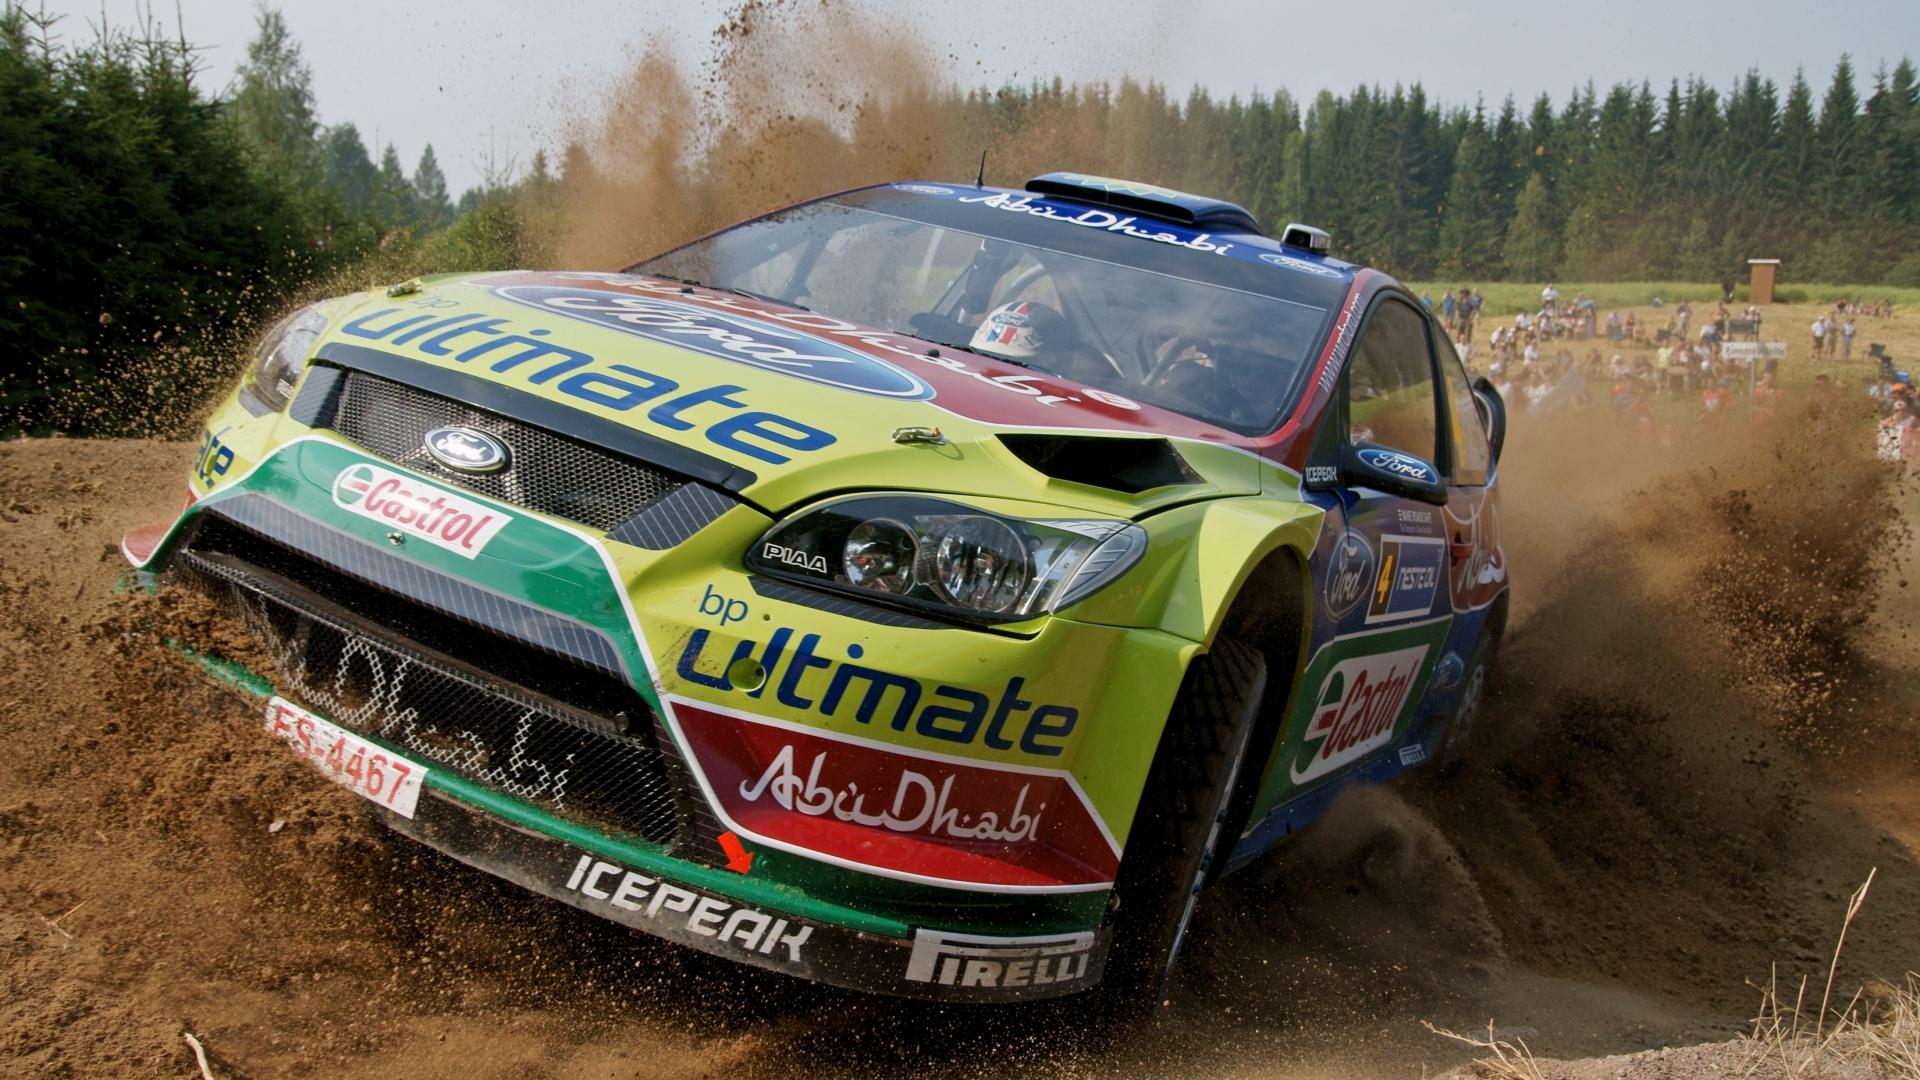 rally car, wallpaper, скачать фото, ралли машина